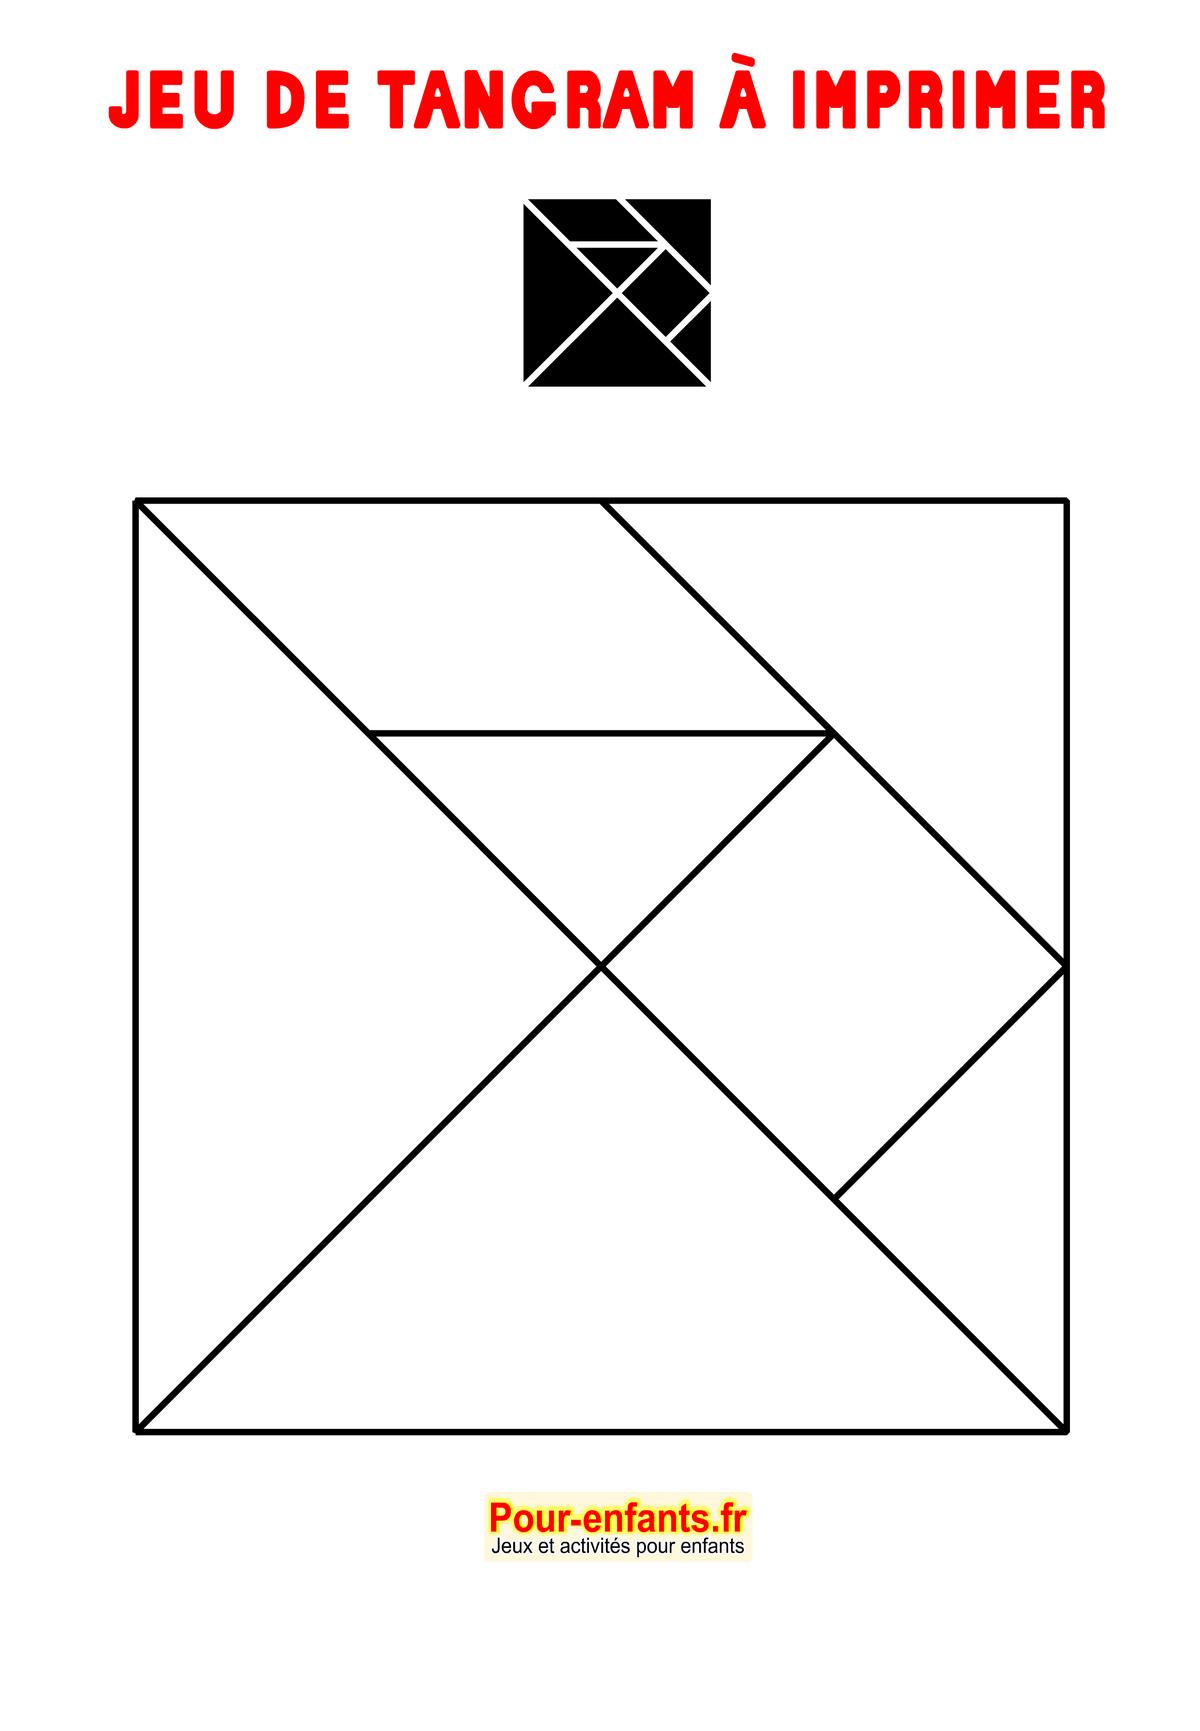 Tangram À Imprimer Maternelle Gratuit Jeux Tangrams dedans Jeux Maternelle Grande Section En Ligne